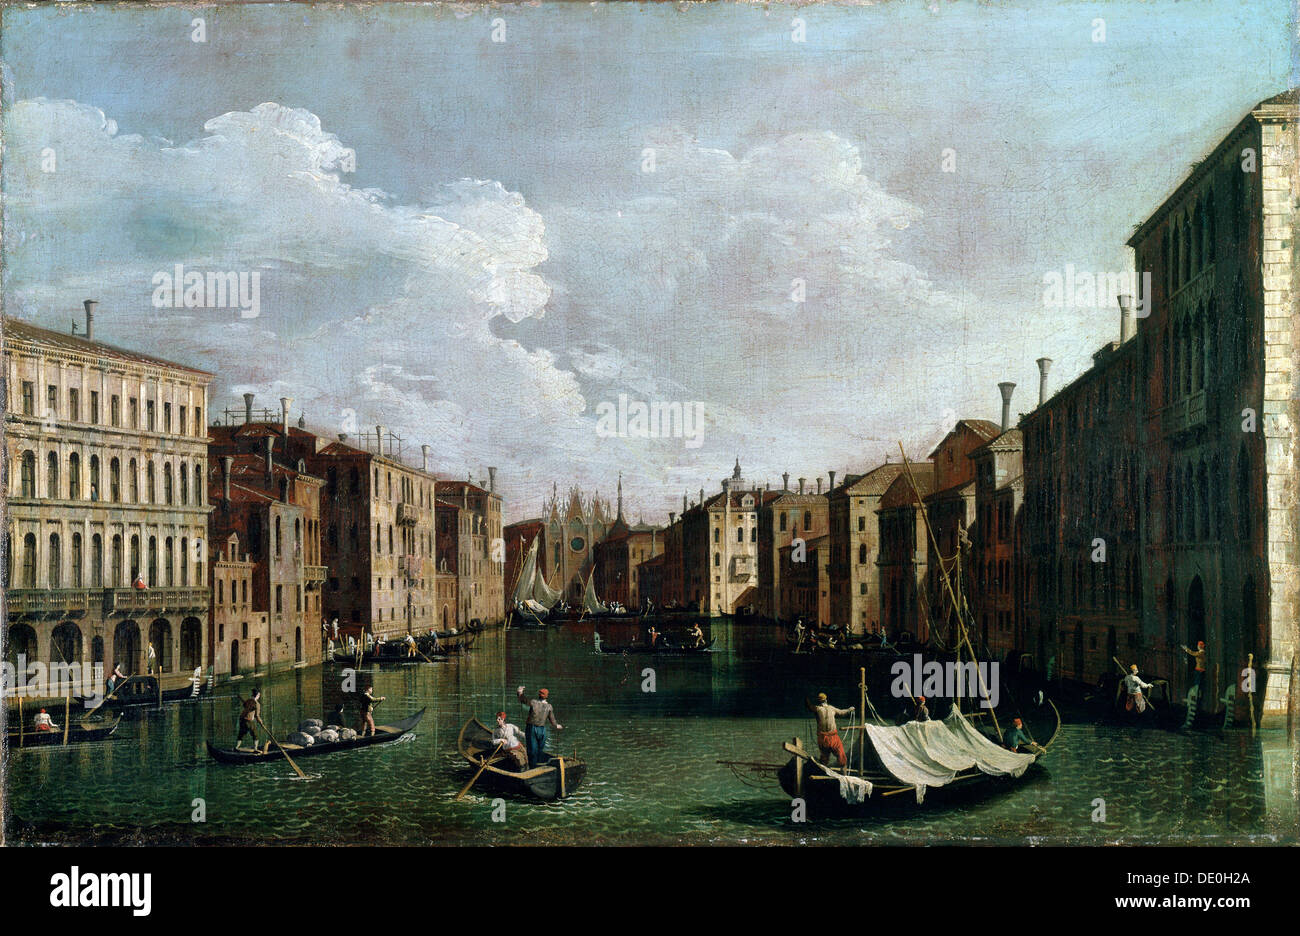 'Venice', 18th century. Artist: Canaletto - Stock Image